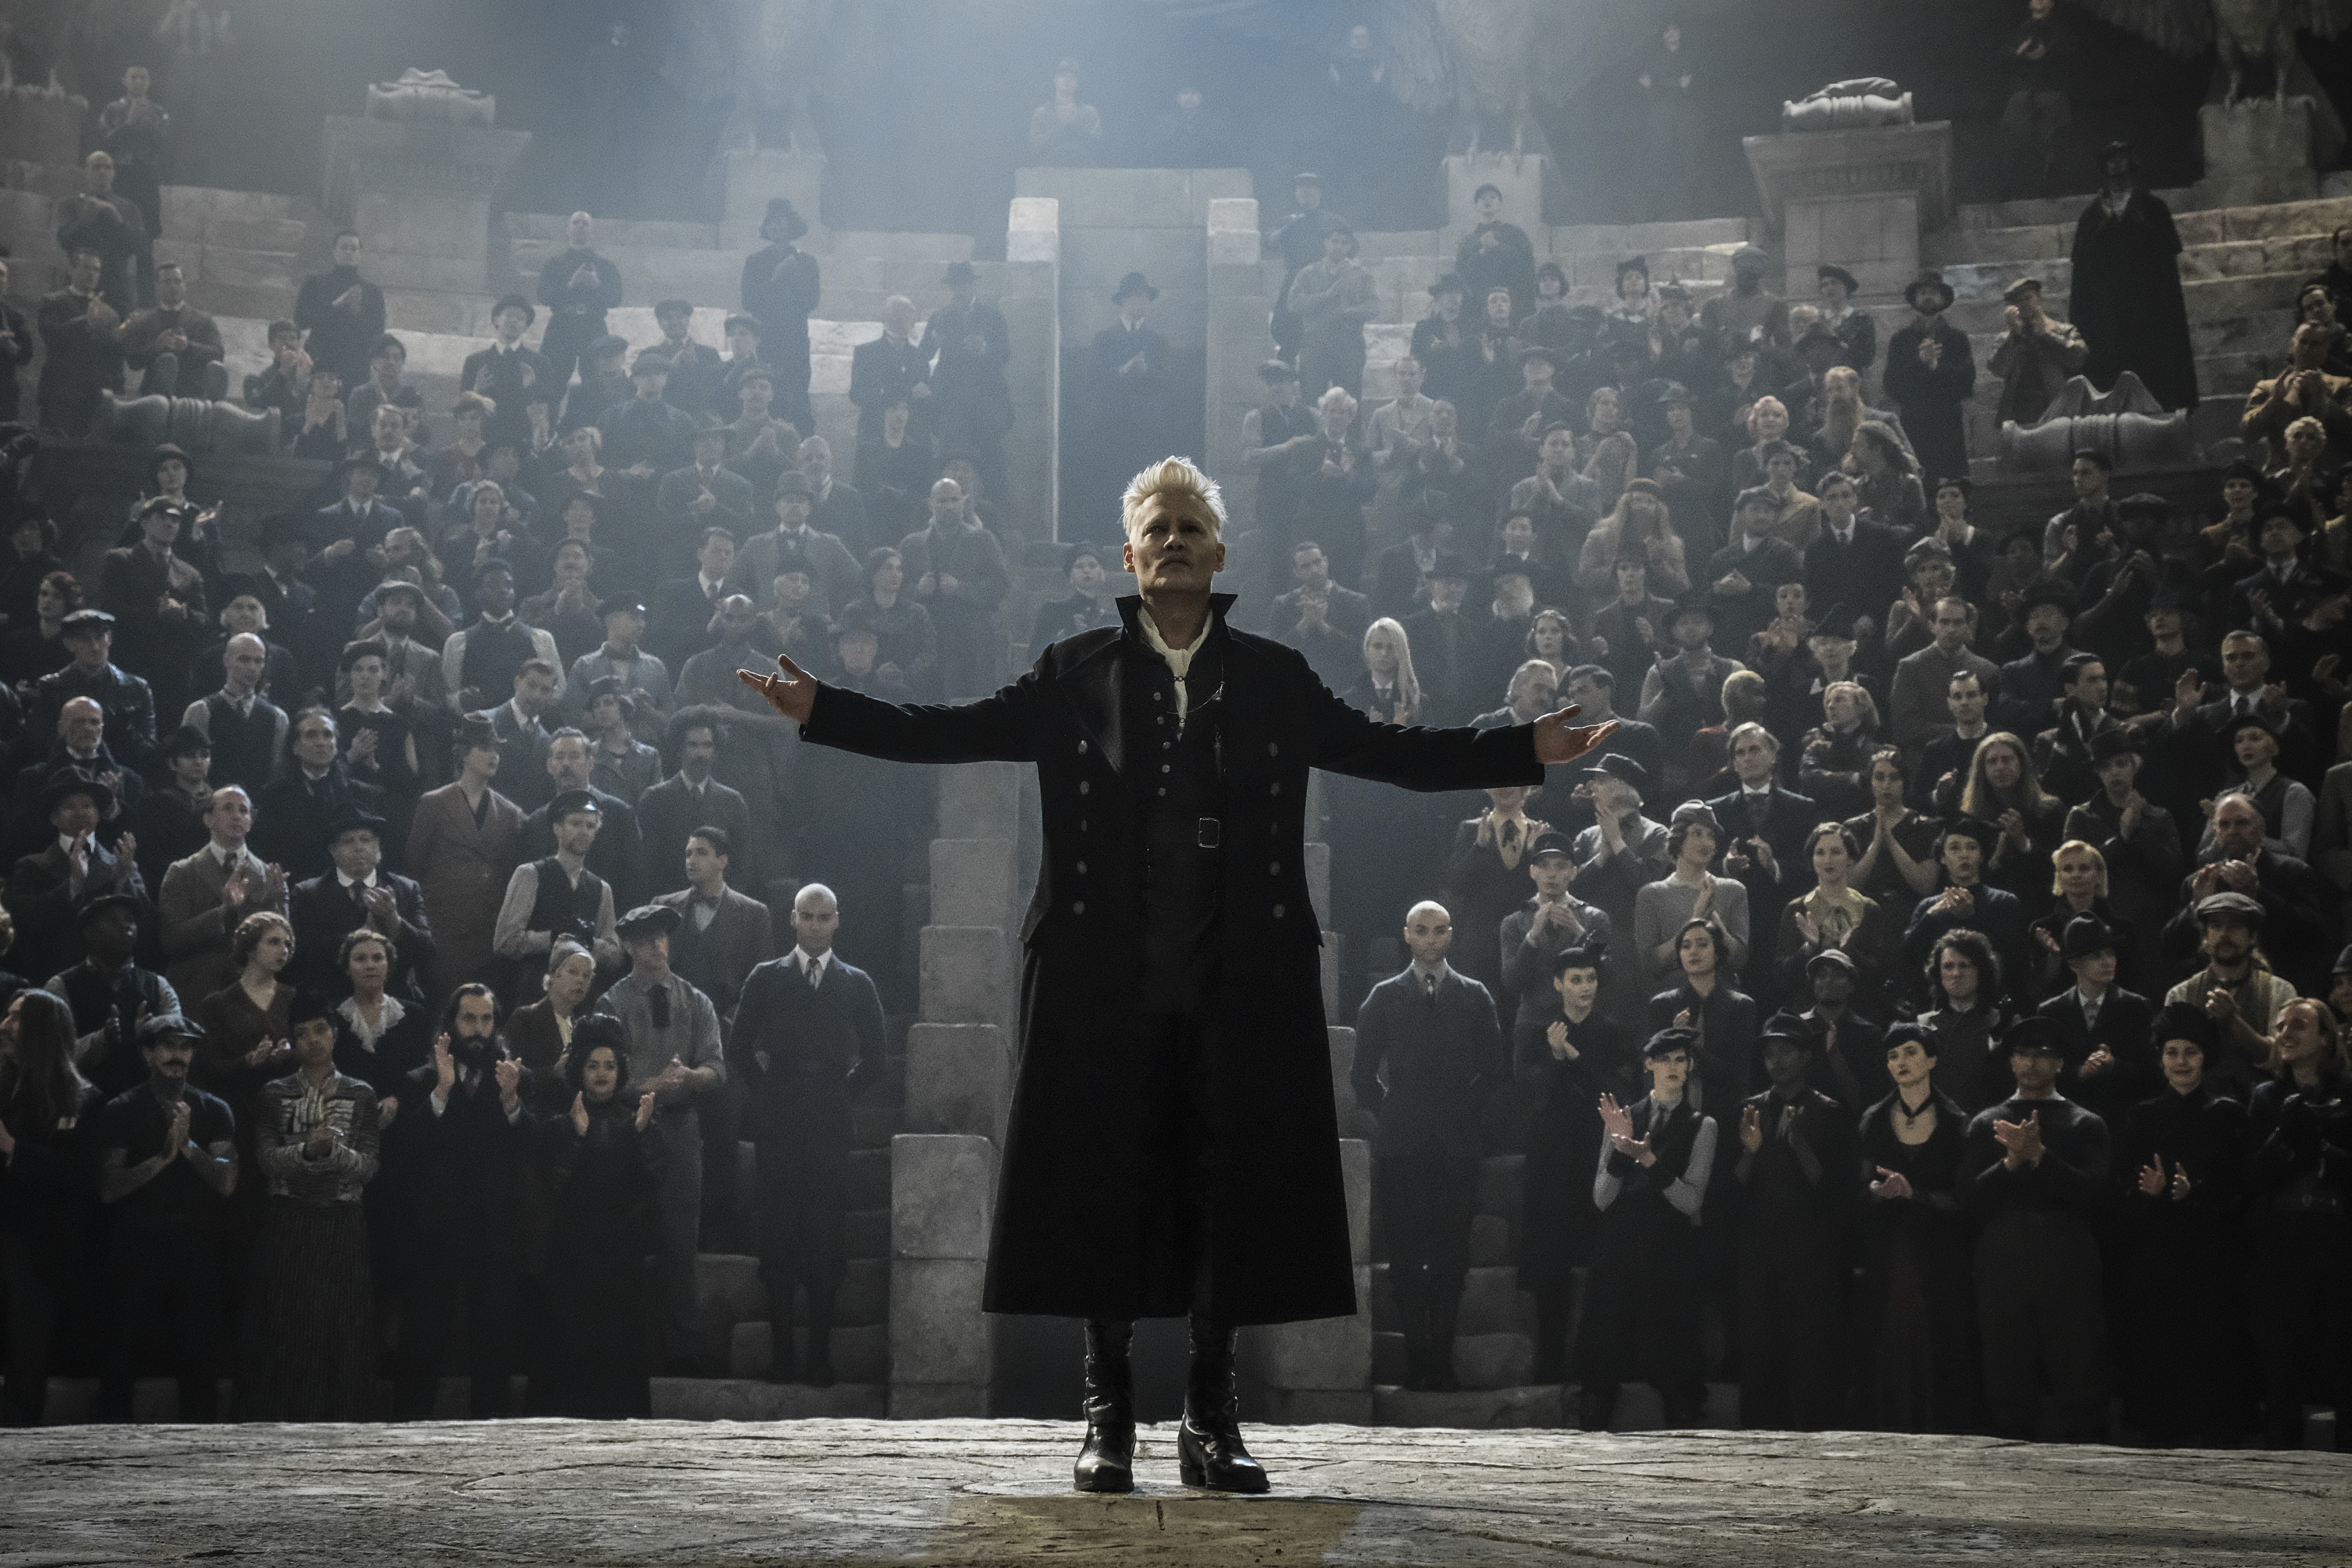 Grindelwald addresses a crowd.